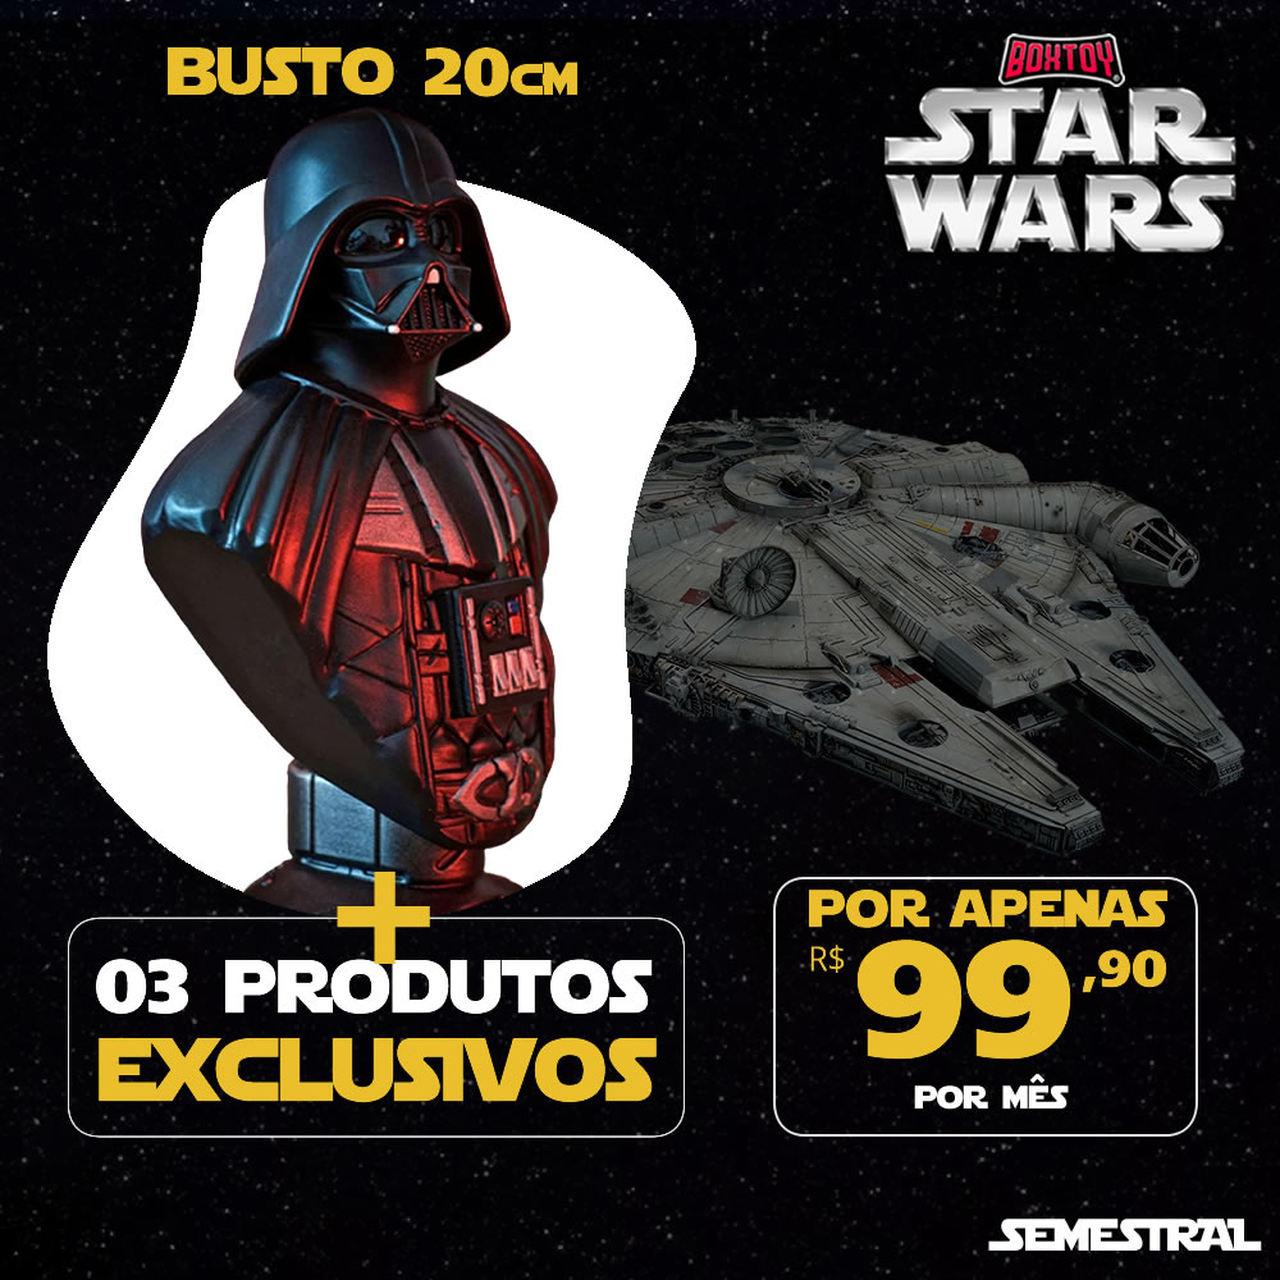 Boxtoy Edição Darth Vader - Star Wars SEMESTRAL  - Boxtoy